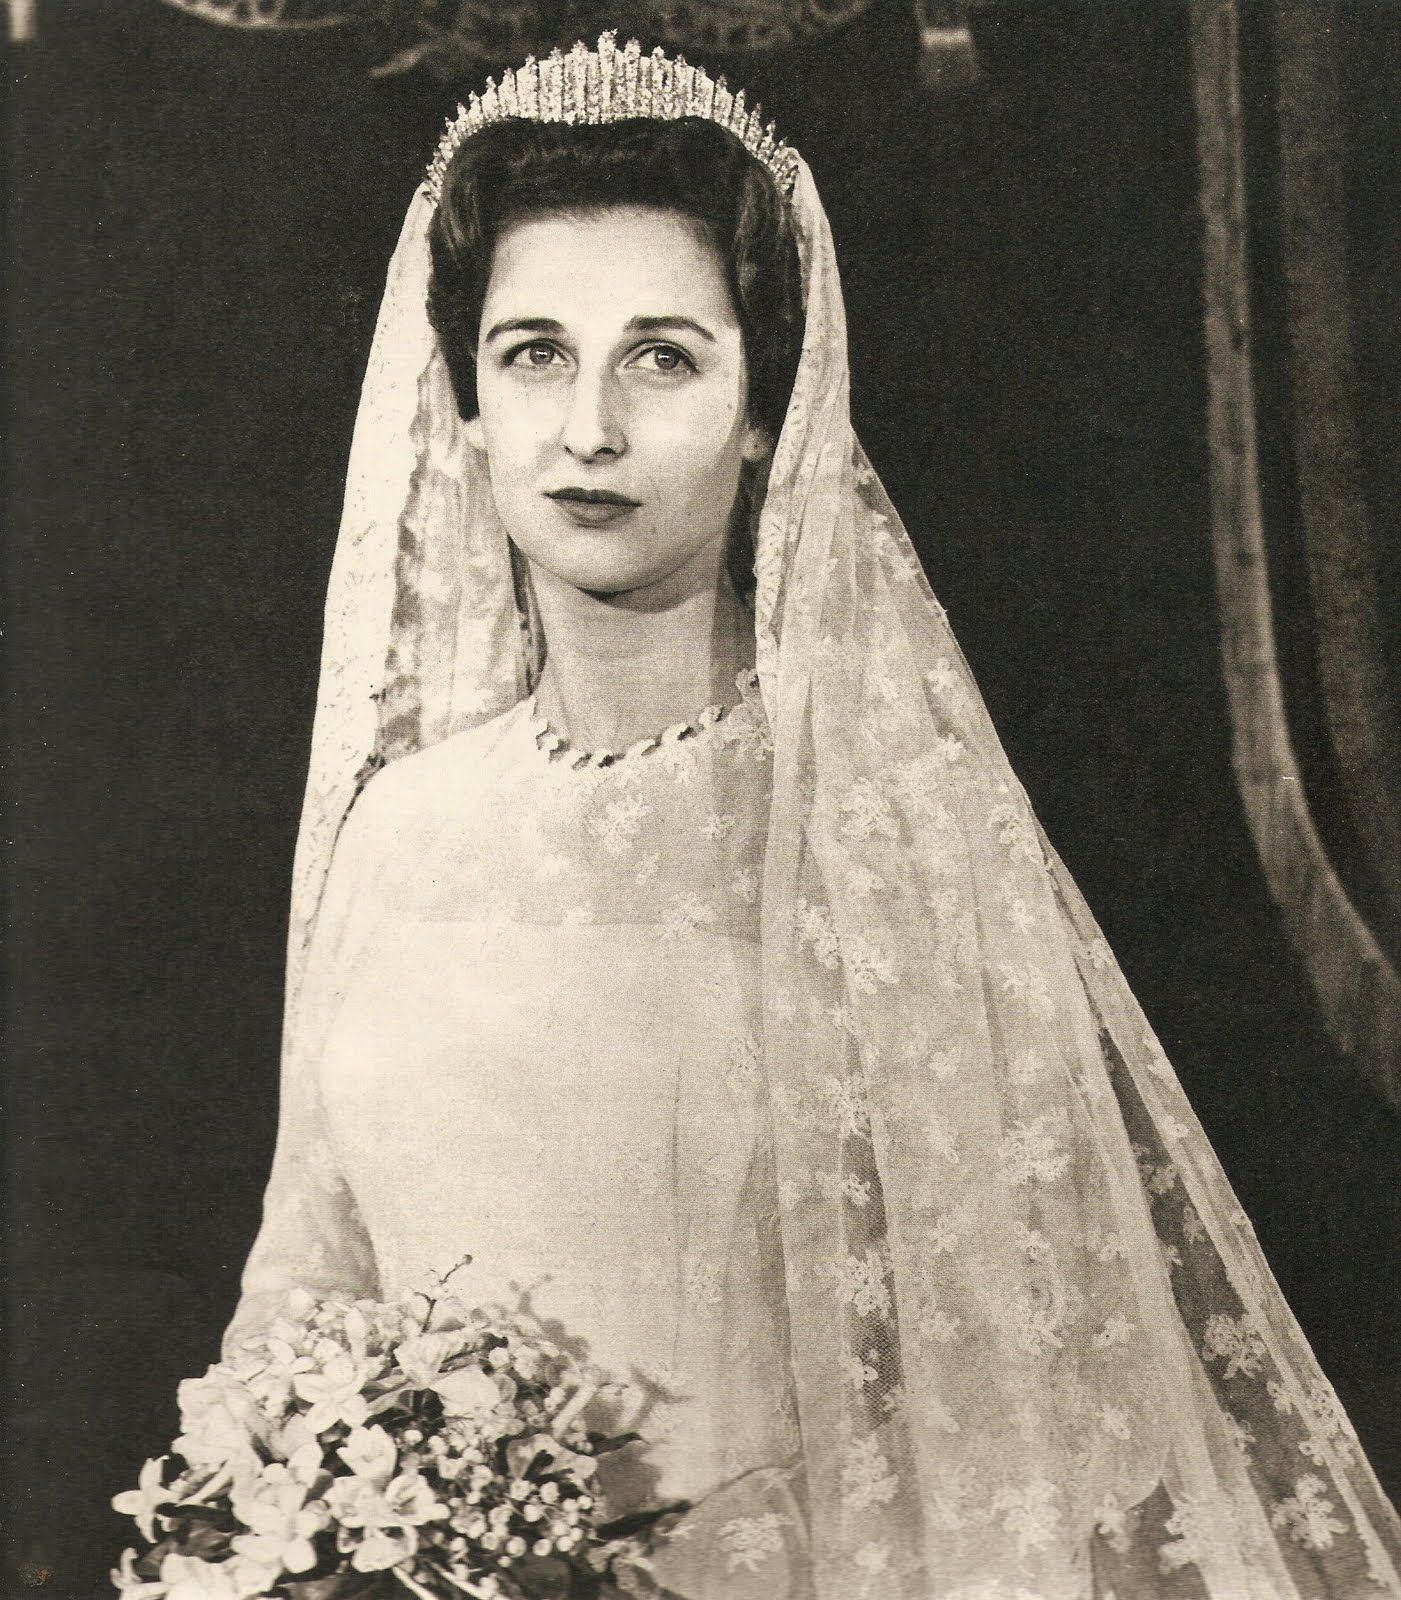 Bling Fling Royal Crowns And Tiaras Princess Alexandra Chic Vintage Bride Vintage Bride [ 1600 x 1401 Pixel ]